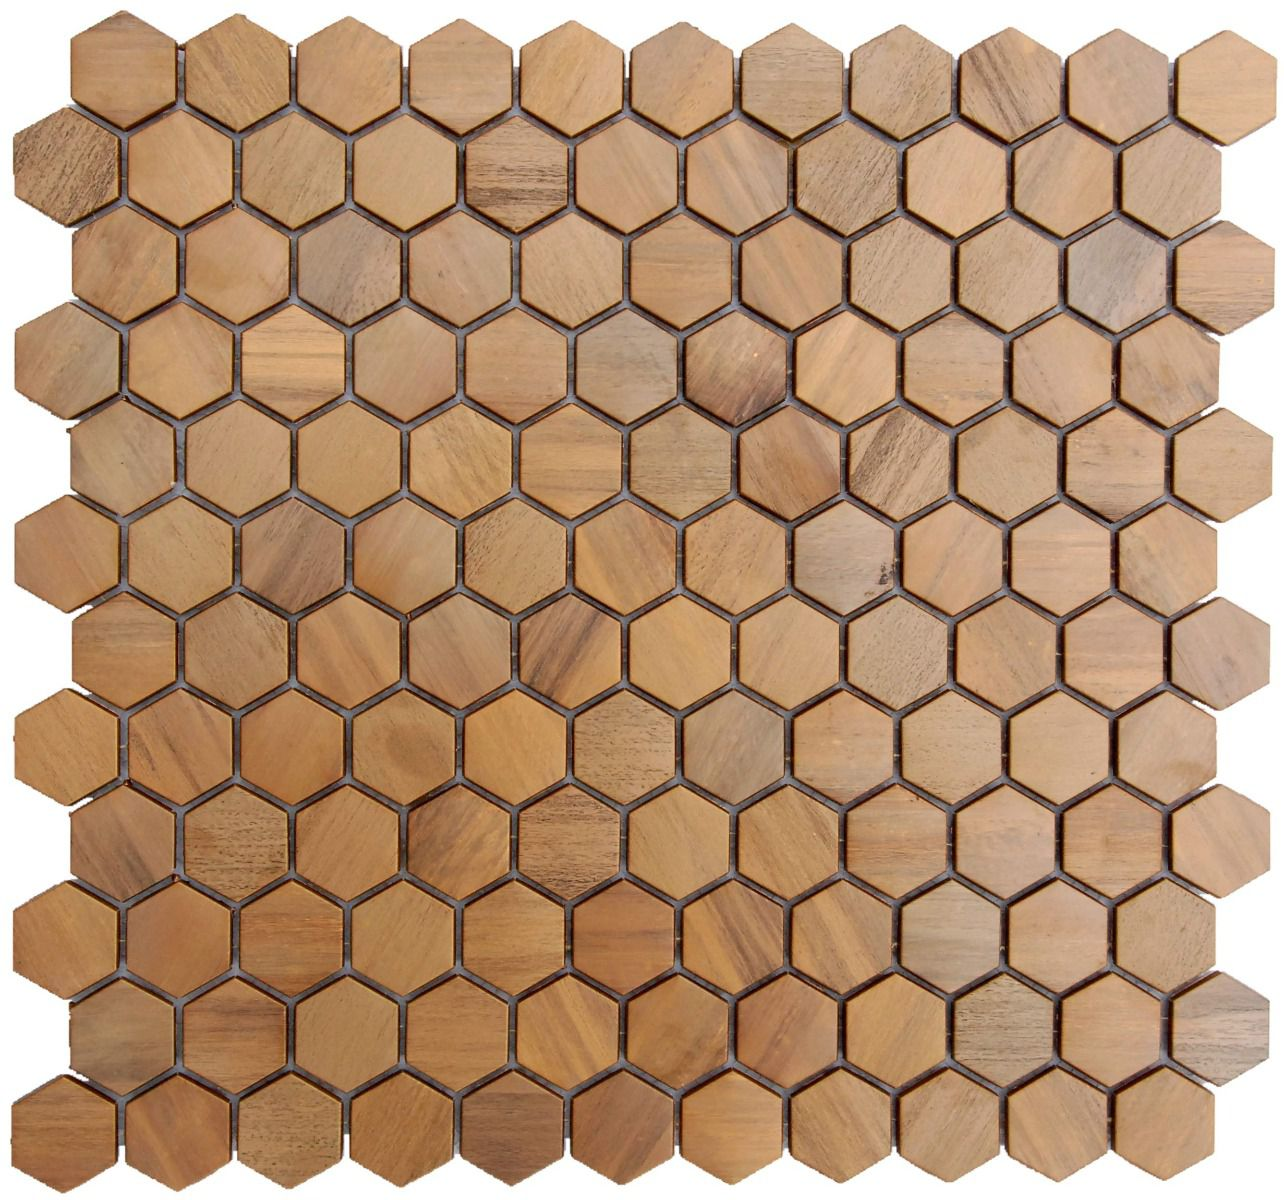 Bronze Copper Mosaic Tile Hexagon